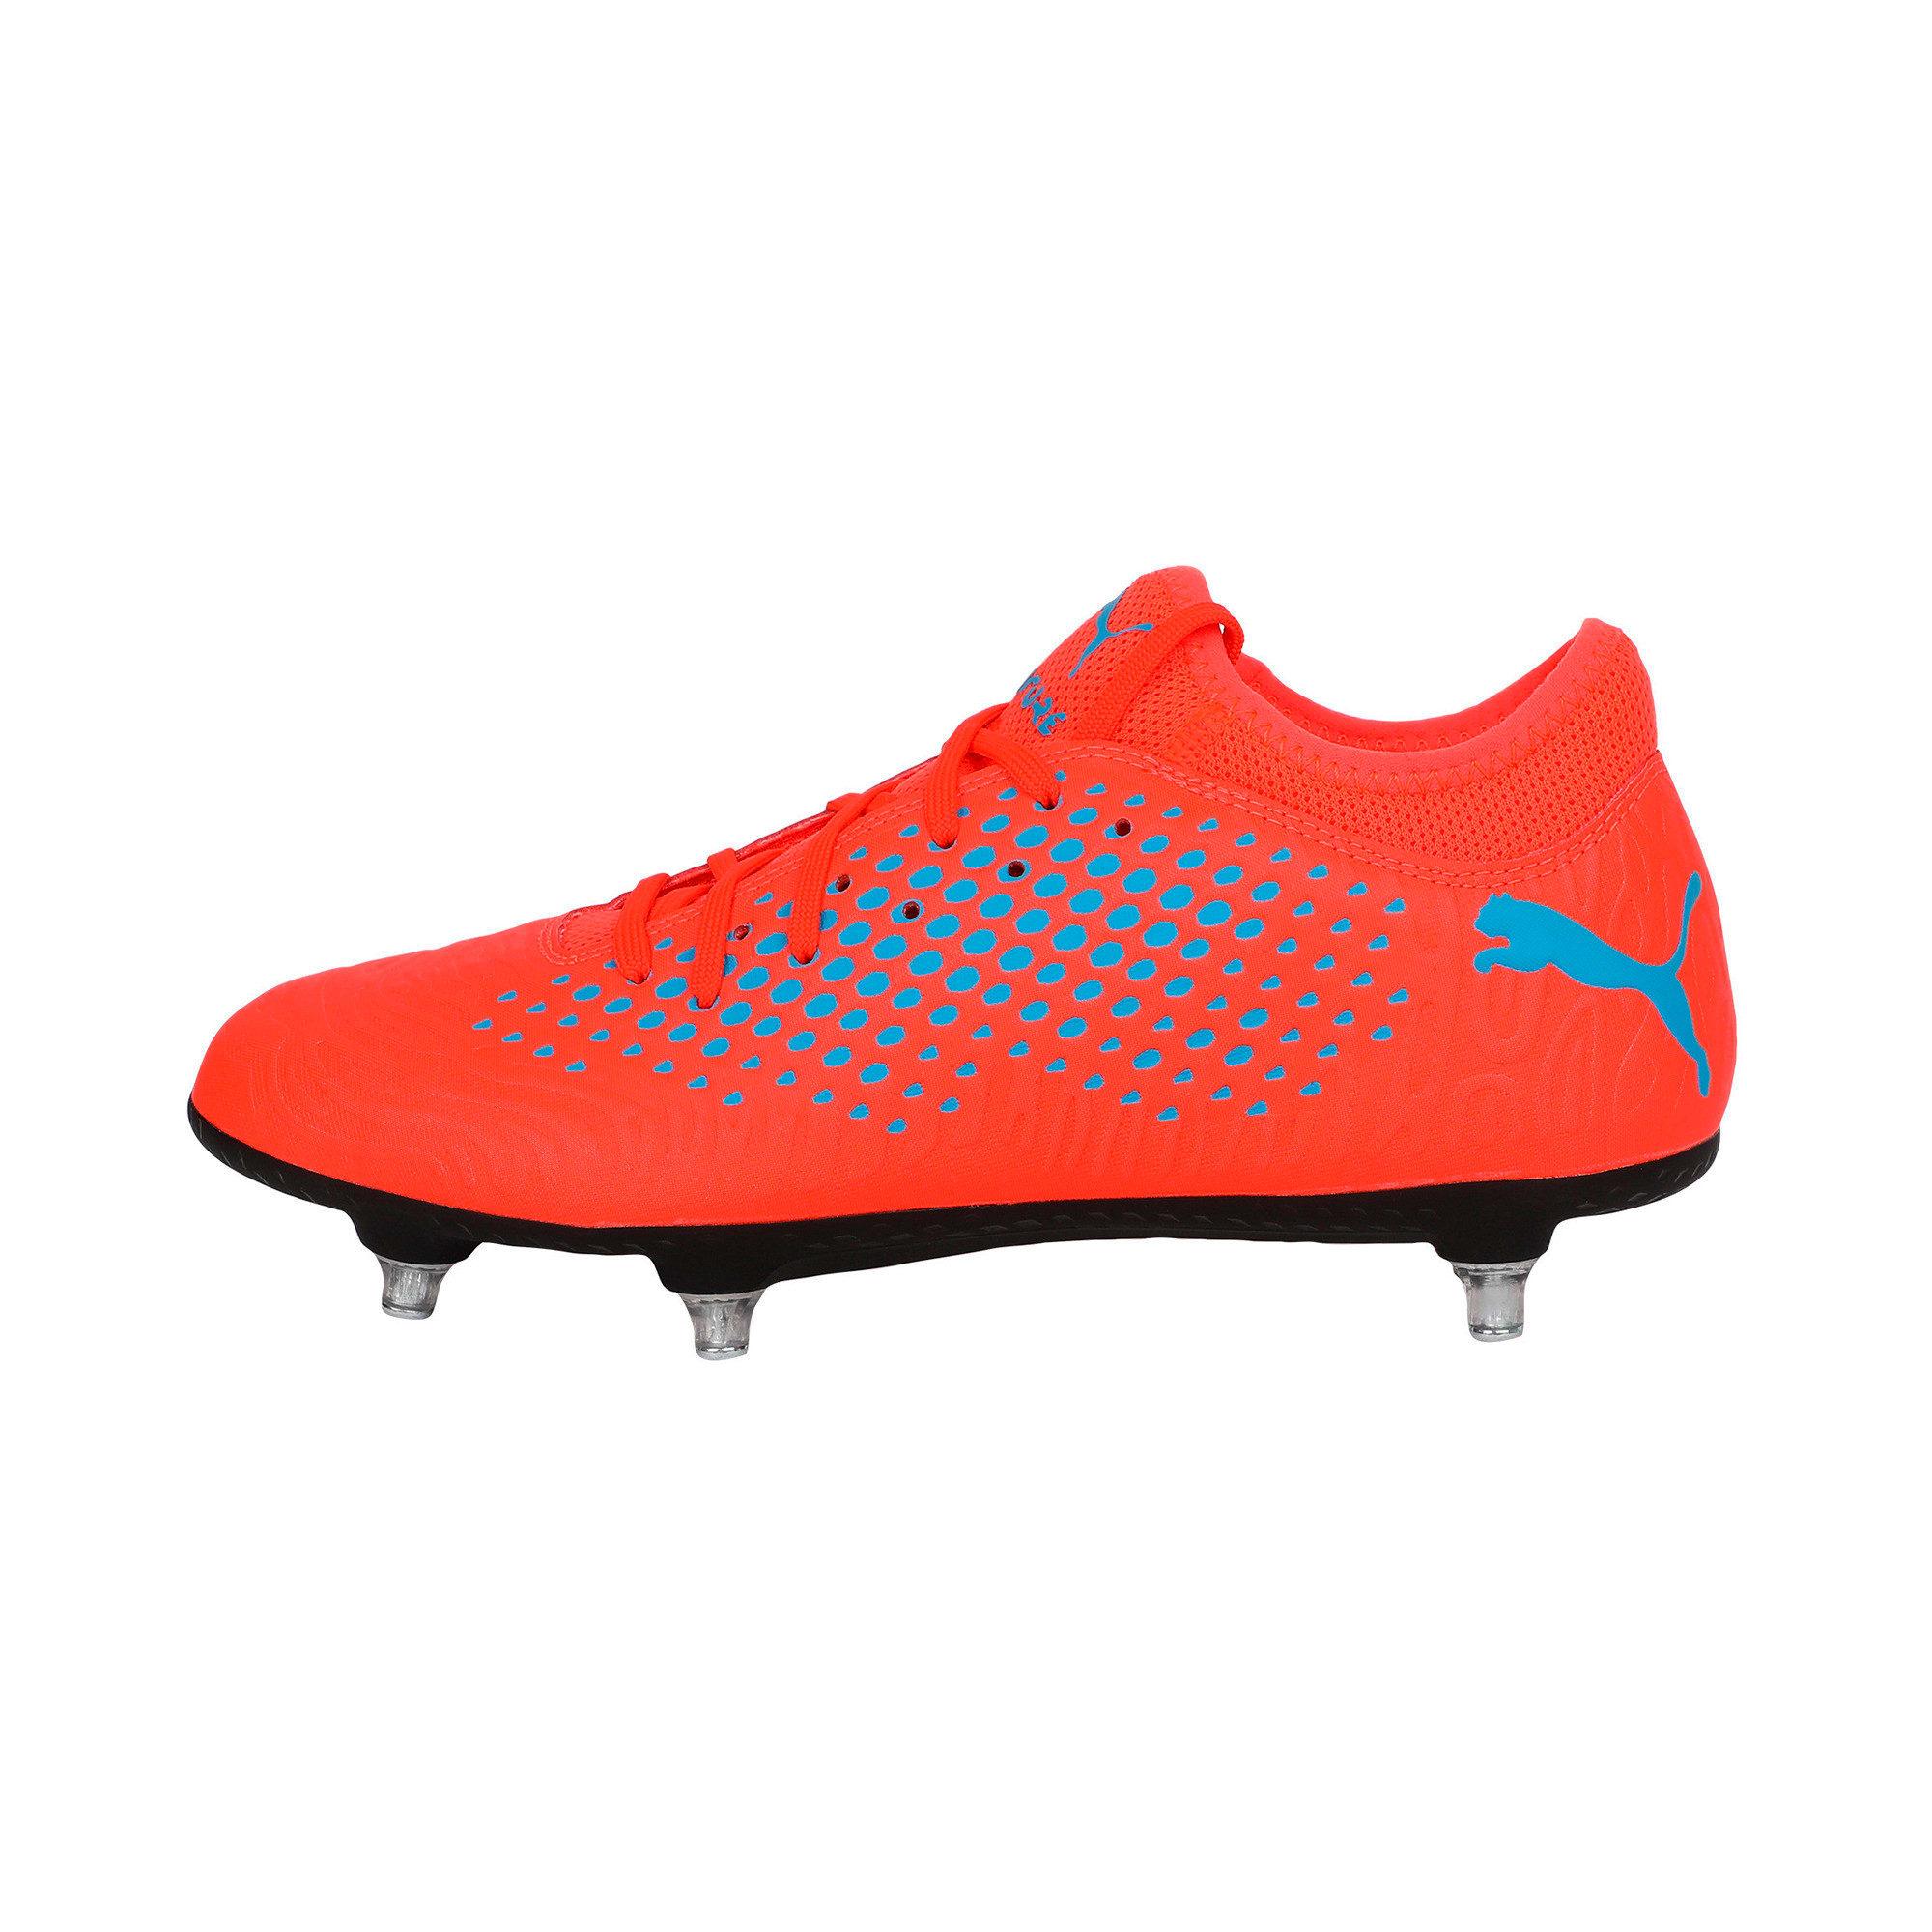 Thumbnail 1 of FUTURE 19.4 SG Men's Football Boots, Red Blast-Bleu Azur, medium-IND